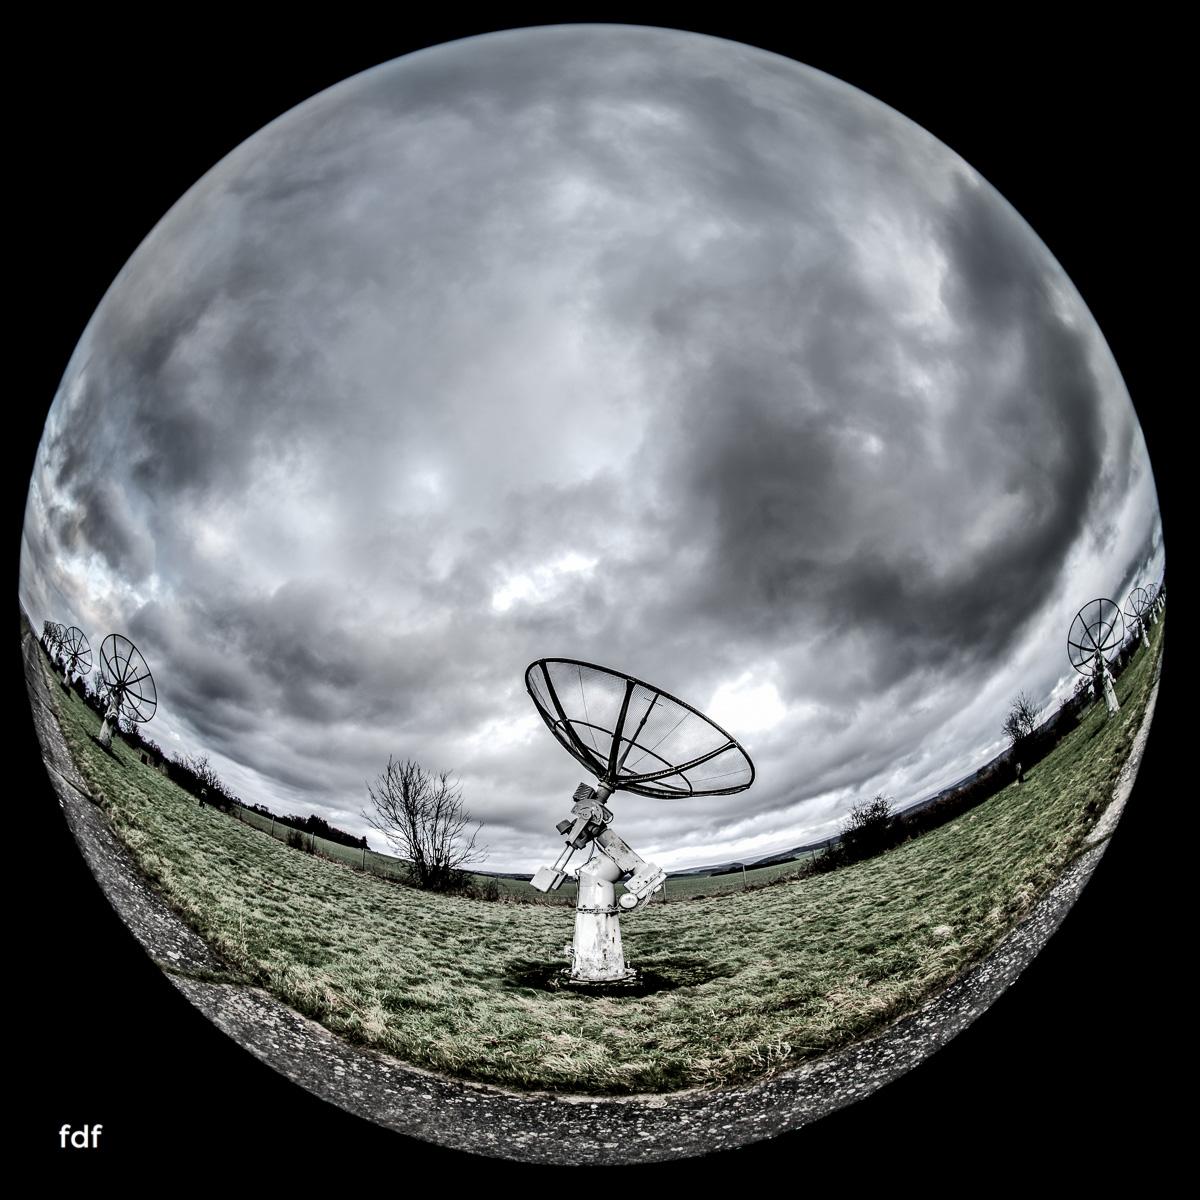 Outer-Space-Radioteleskop-Antennen-Belgien-Urbex-Los-Place-12.jpg